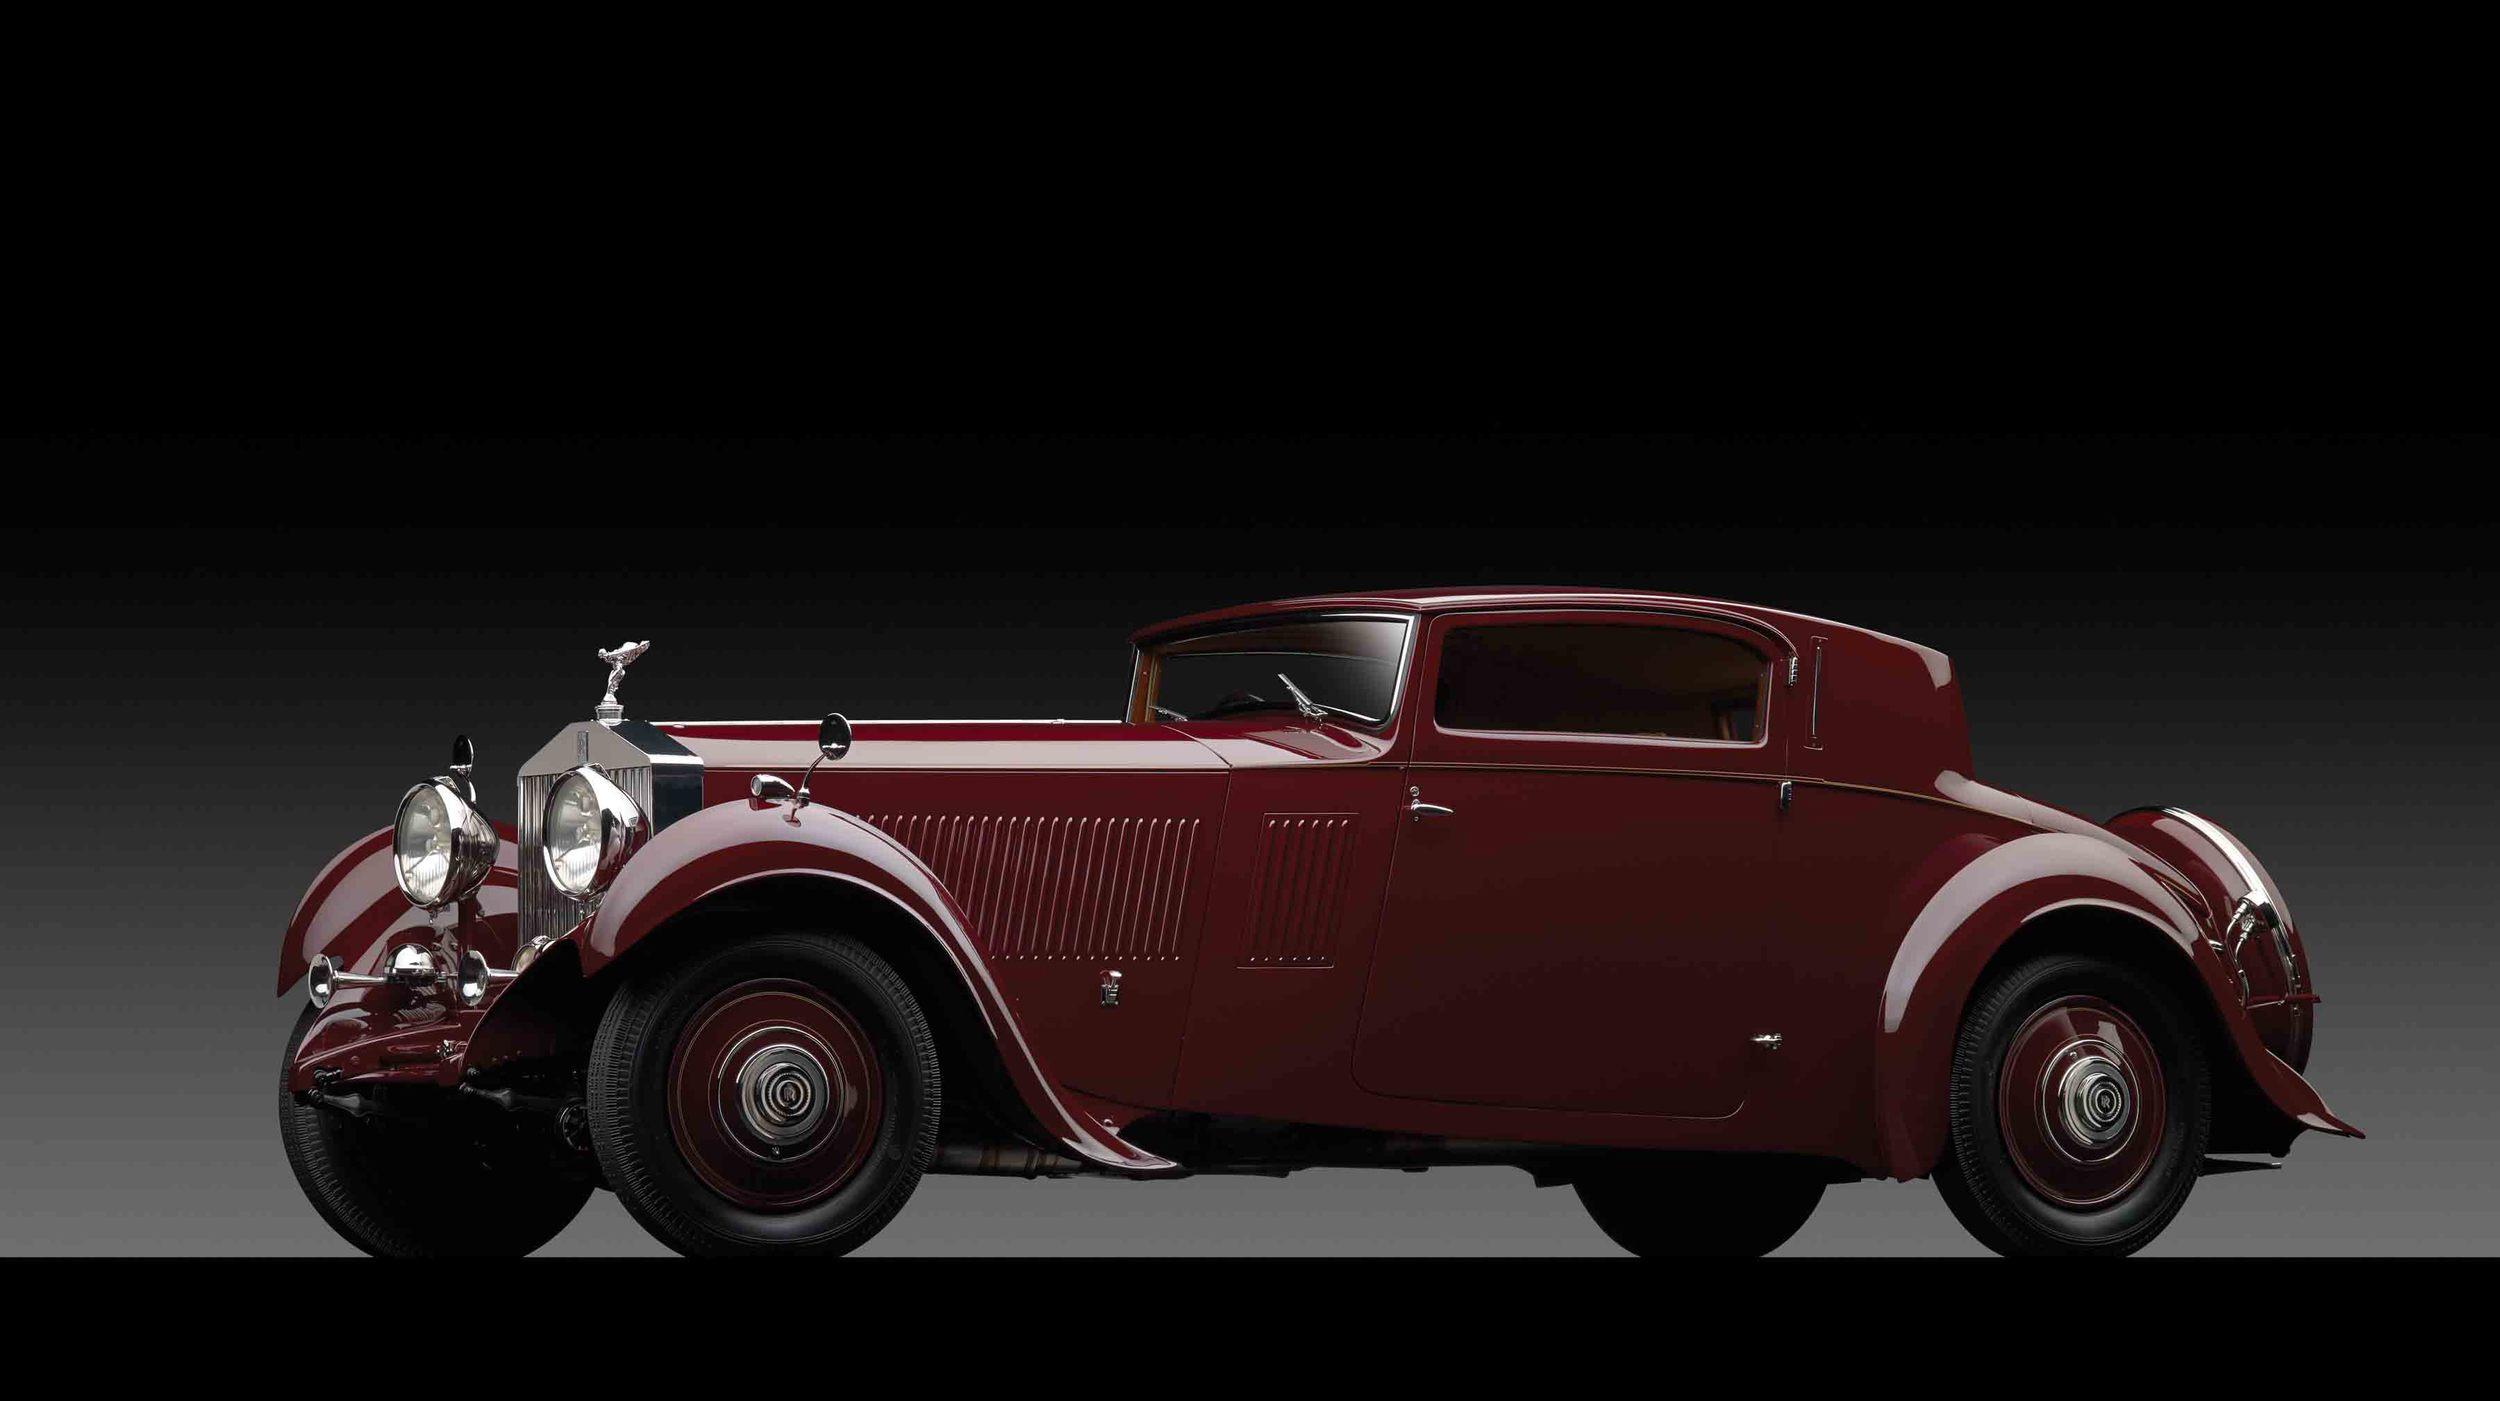 "NY13_r106_001 img alt=""rolls royce phantom continental the car crush the art of the automobile"".jpg"